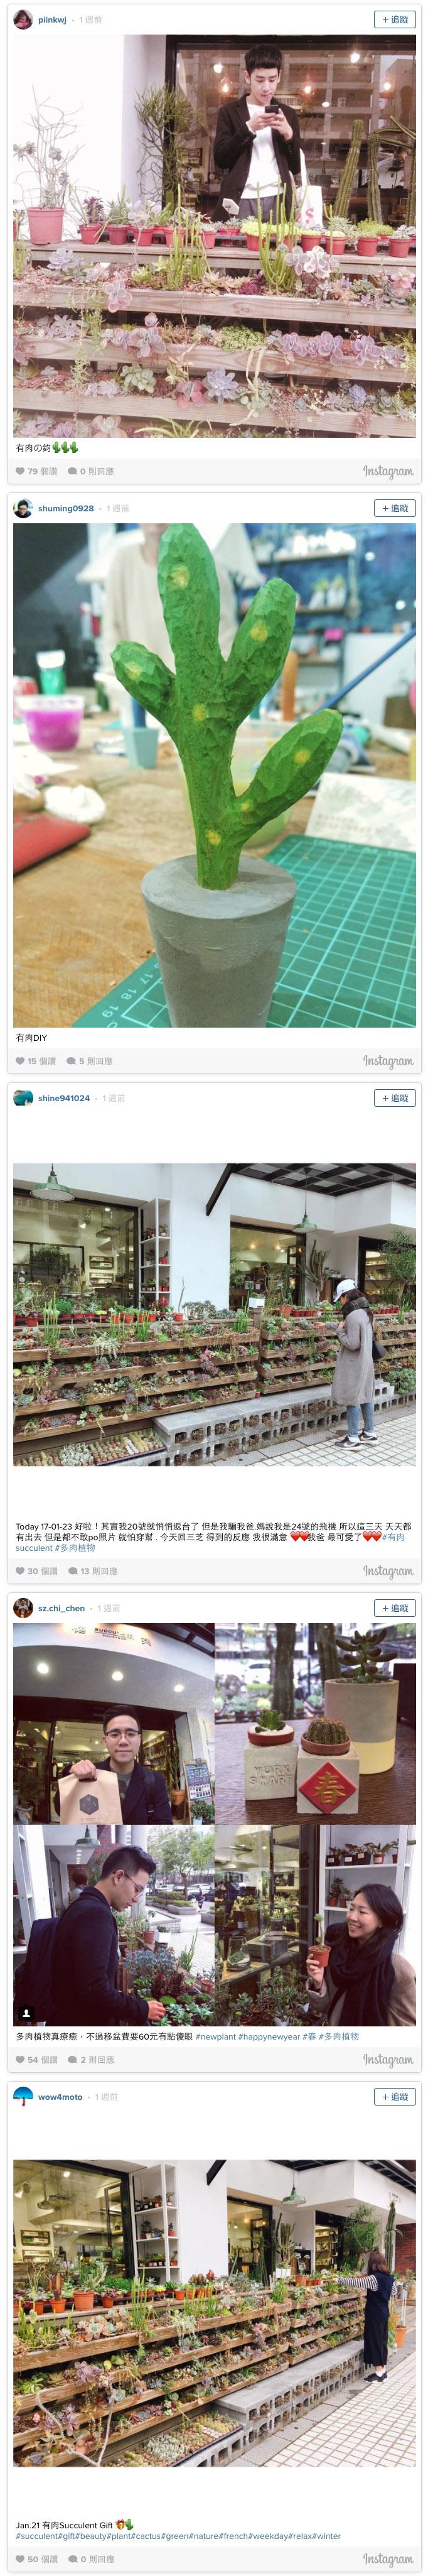 Instagram 肉搜計畫:1 月號 3